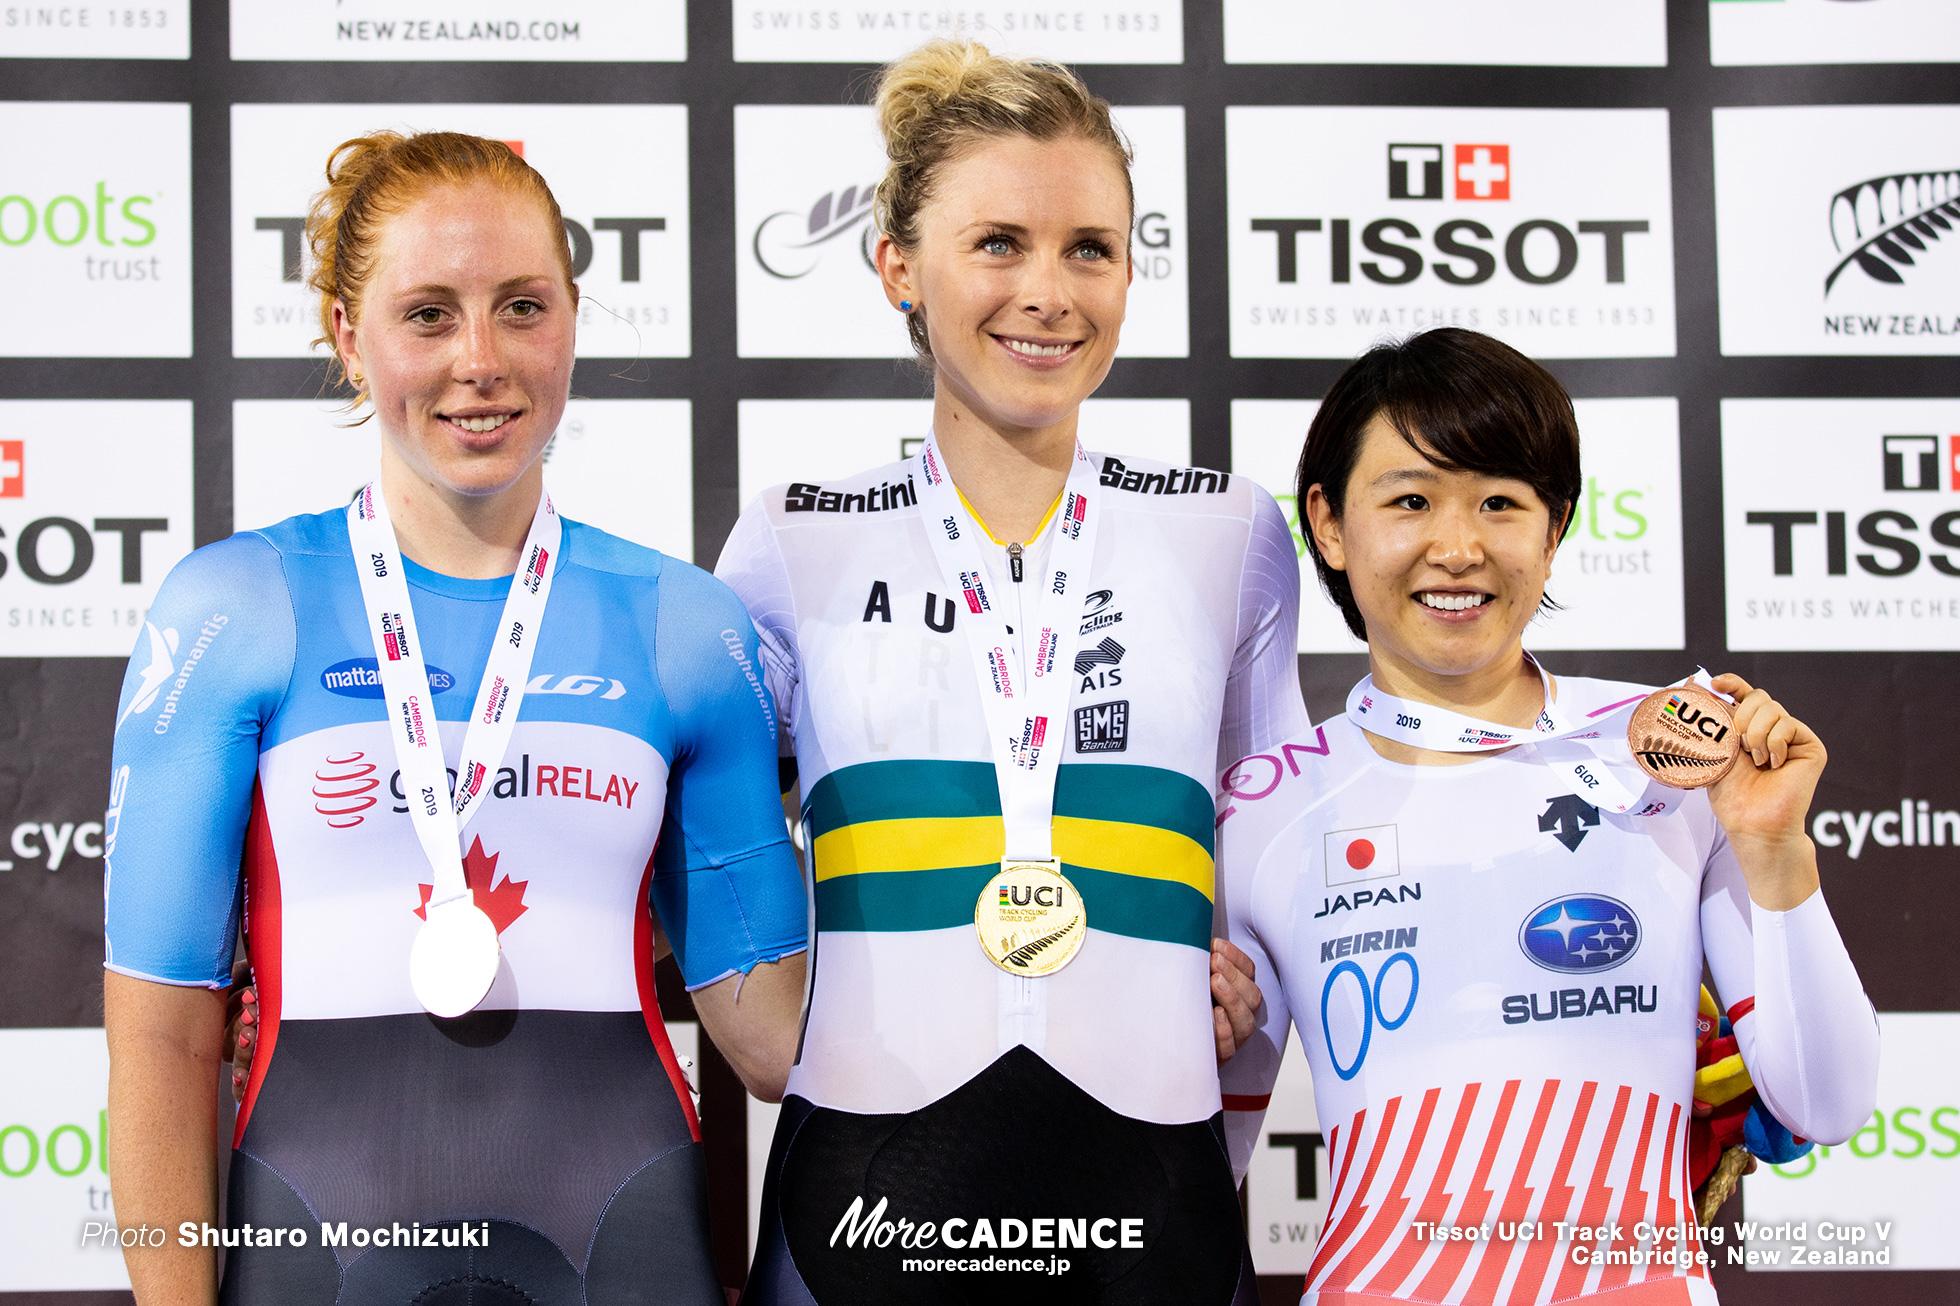 Women's Omnium / Track Cycling World Cup V / Cambridge, New Zealand